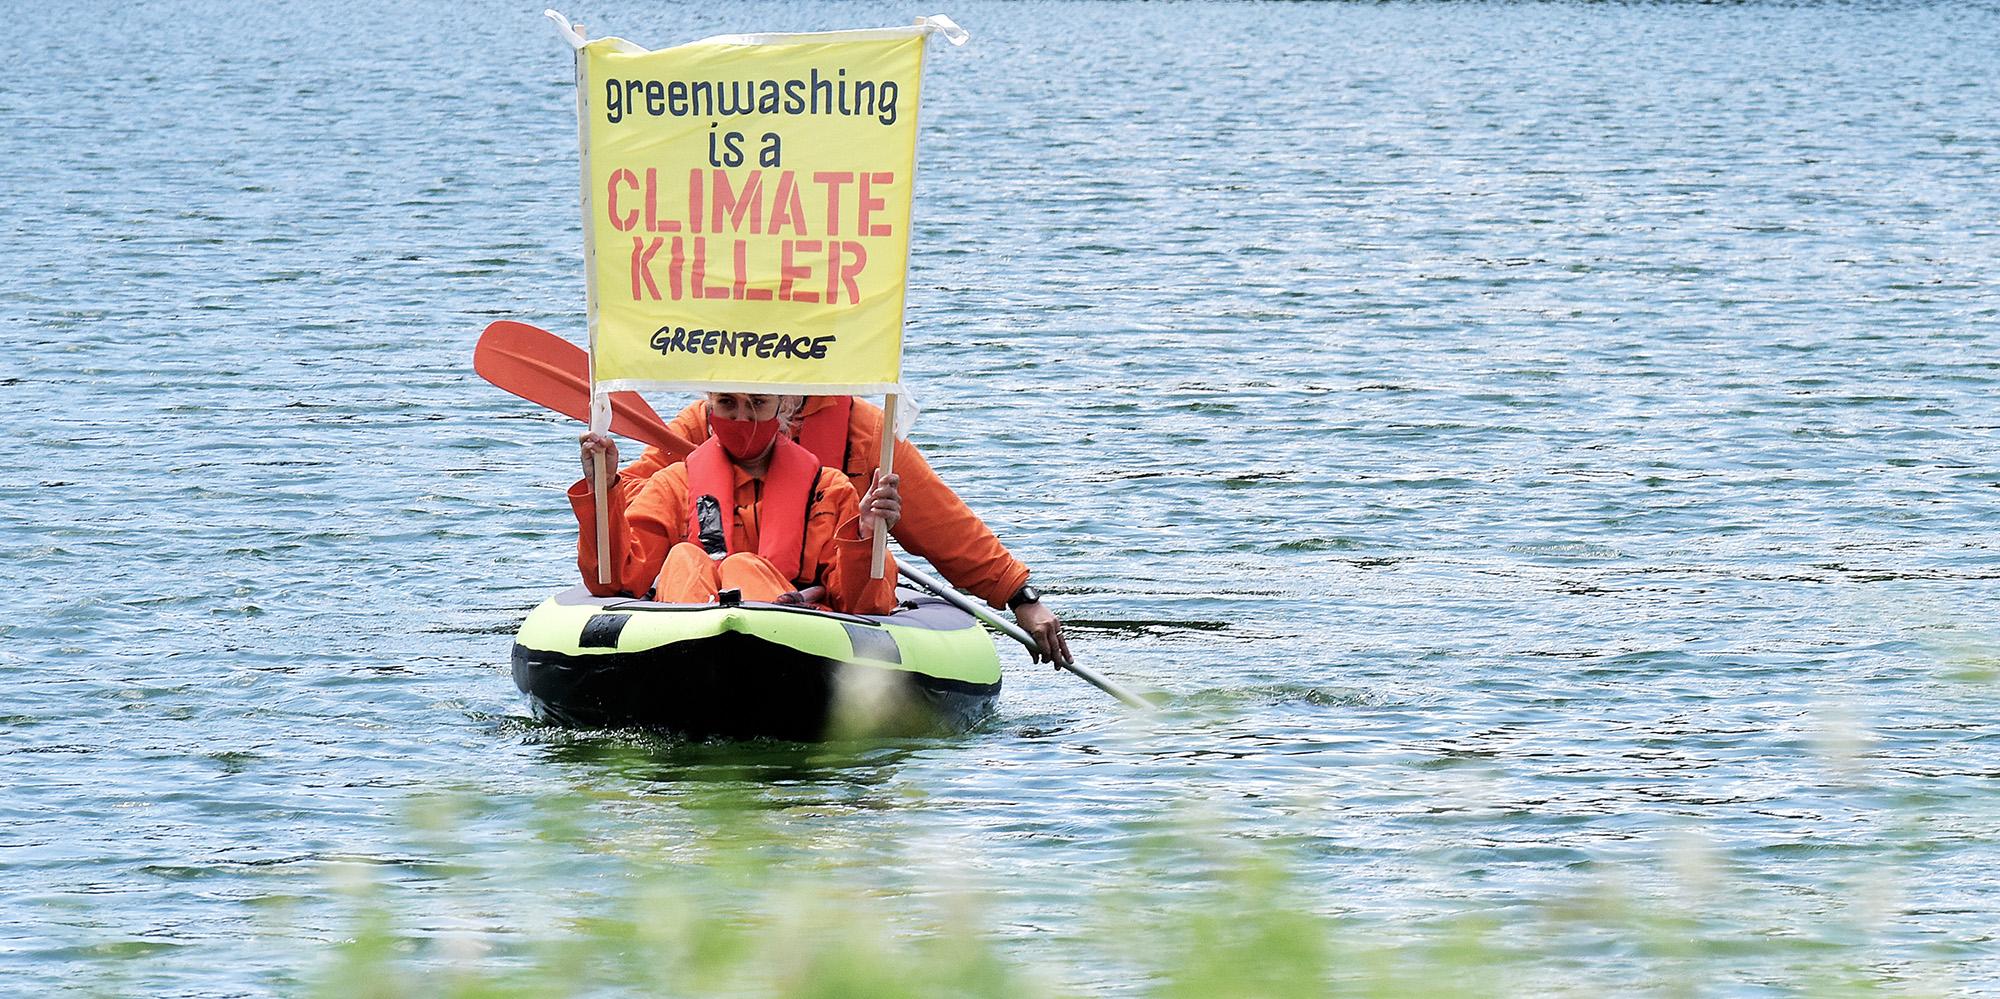 Забастовка активистов Greenpeace против гринвошинга